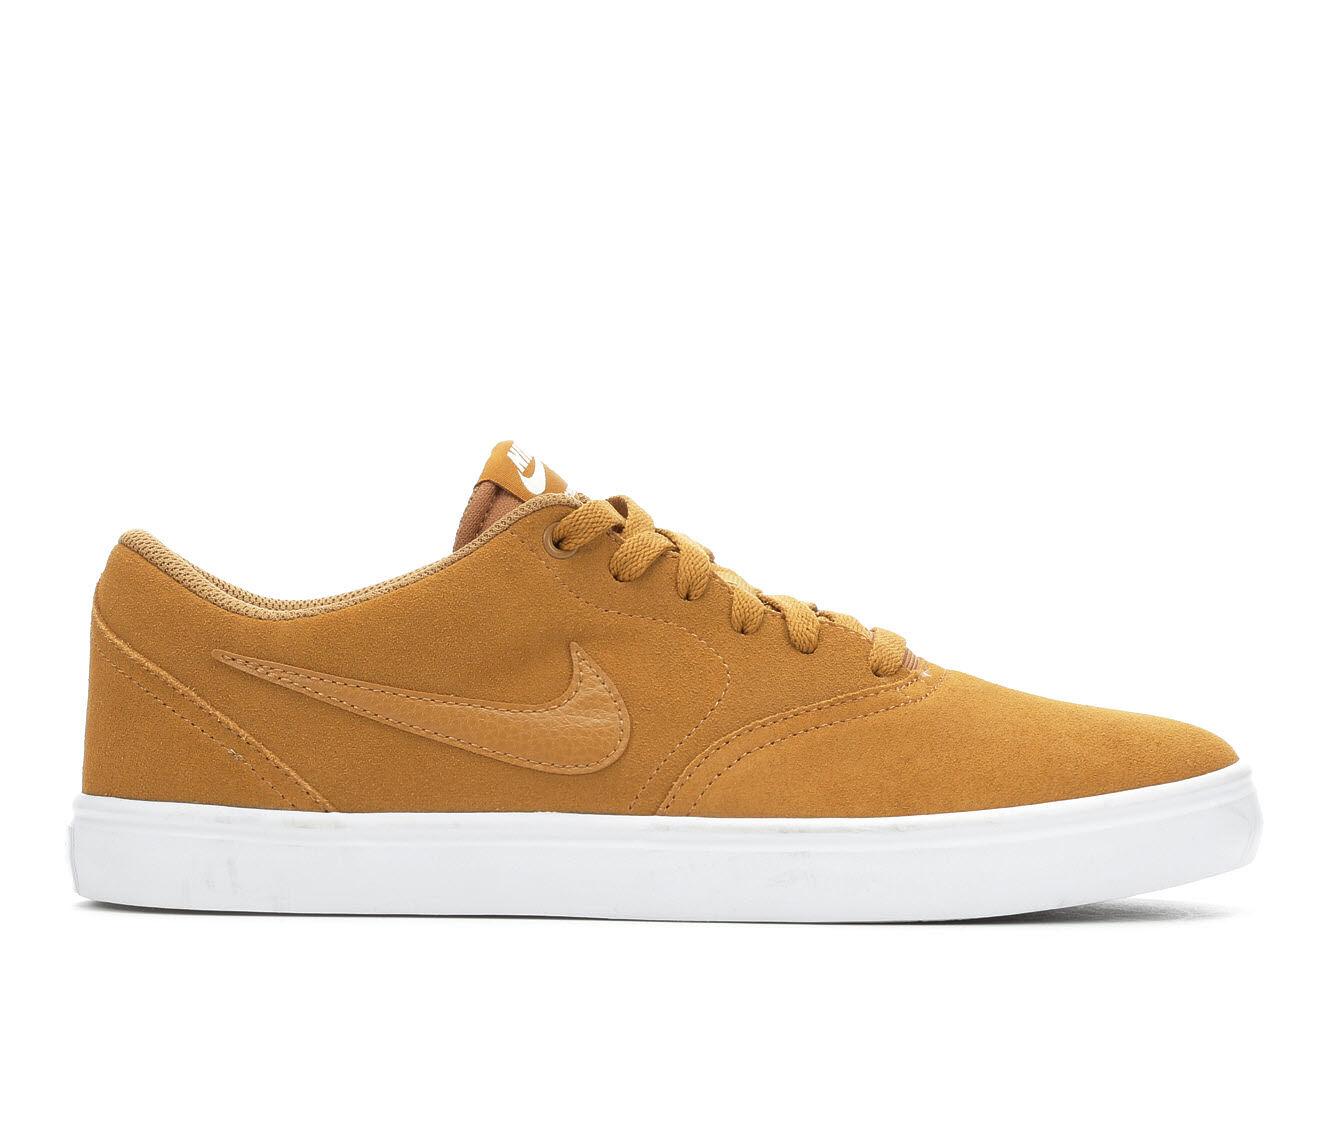 uk shoes_kd1817